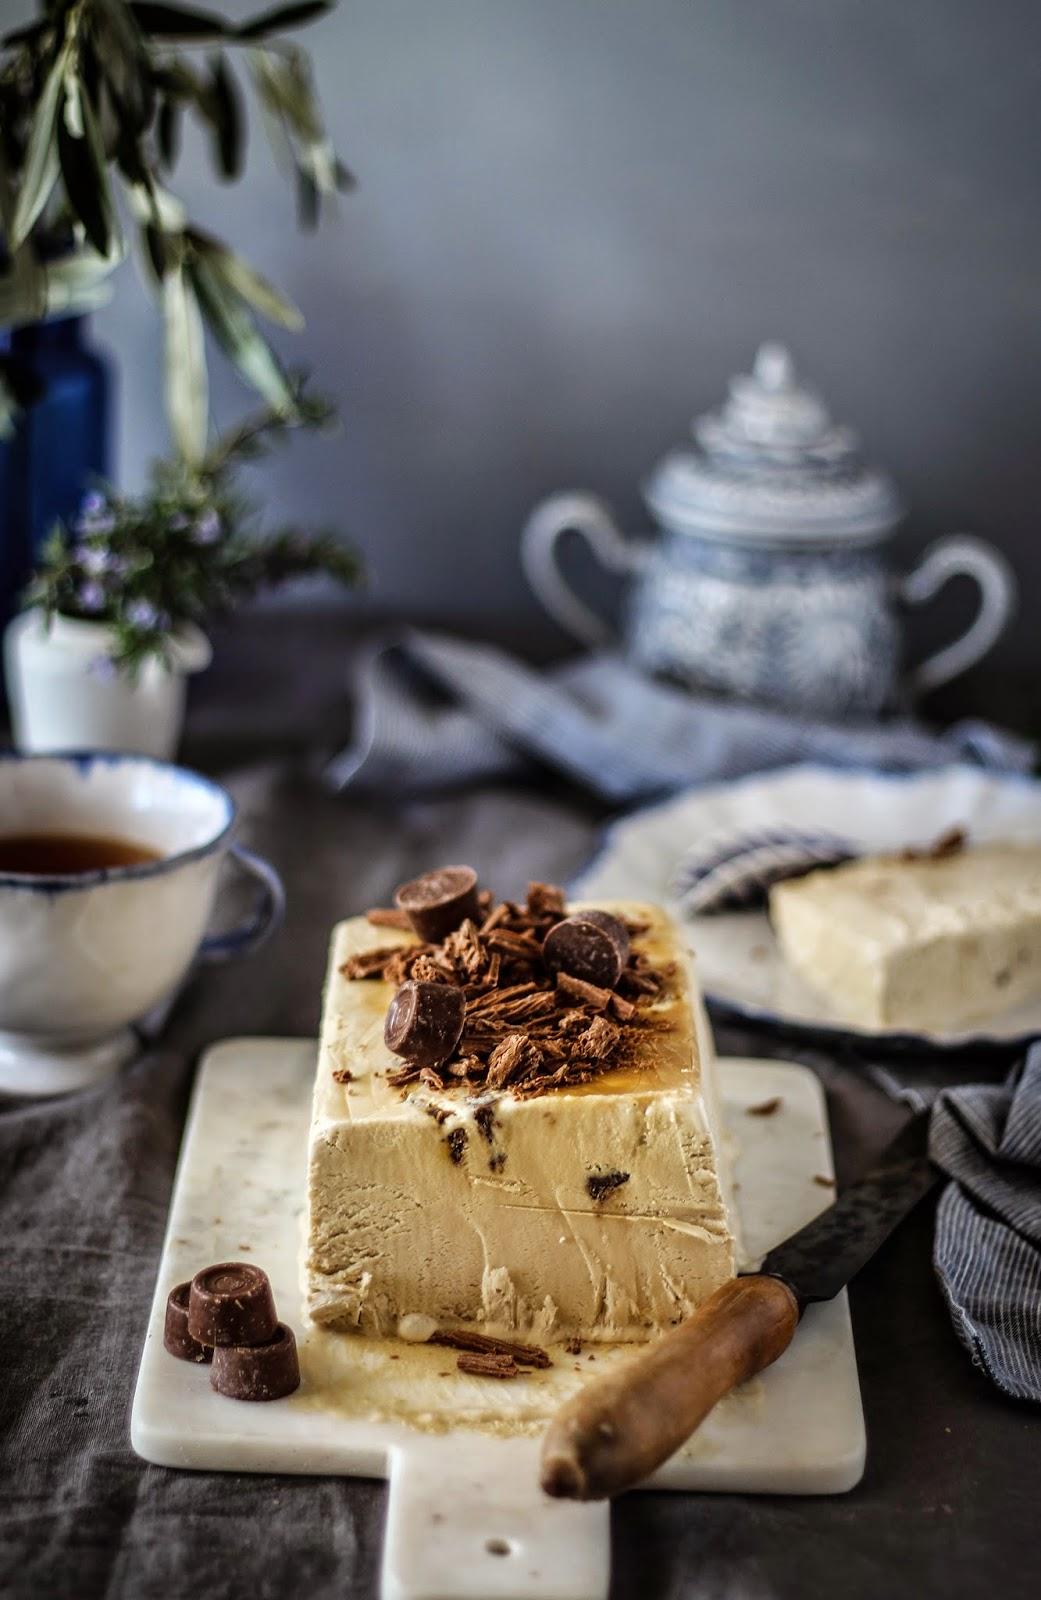 espresso semifreddo recipe from lomelinos icecream and a giveaway ...